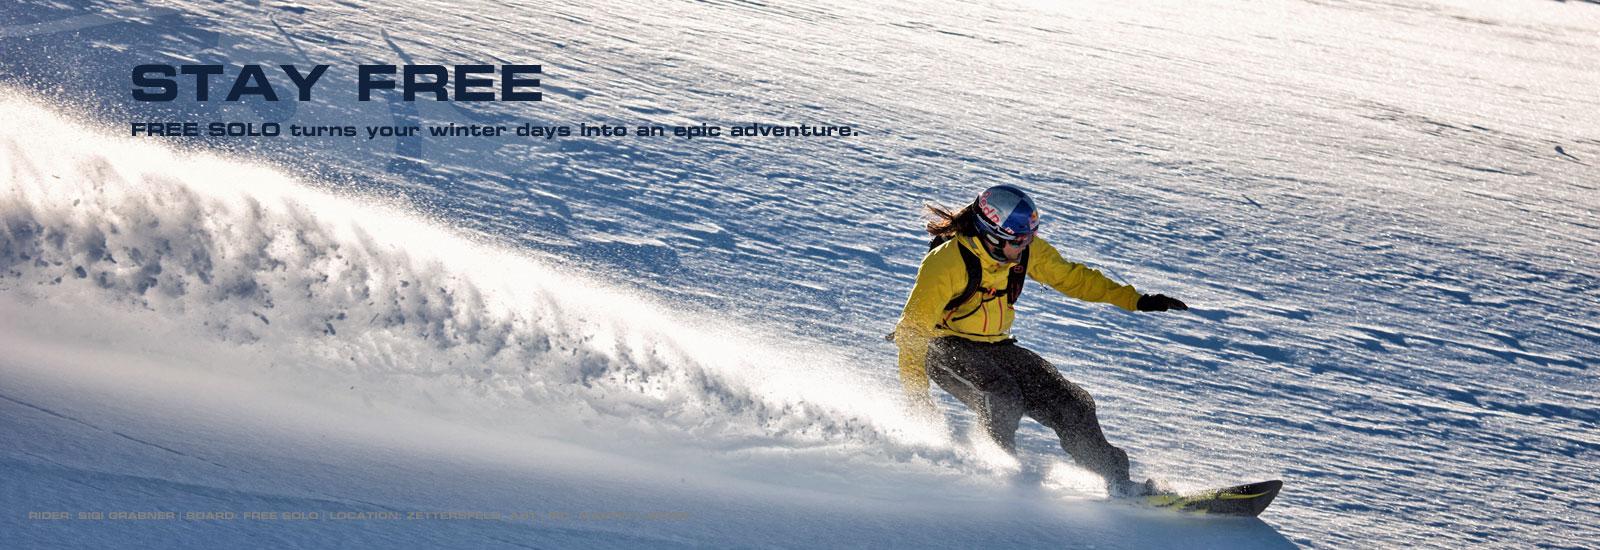 SG SNOWBOARDS Sigi Grabner freeriding Free Solo Zettersfeld Austria pic by Martin Lugger